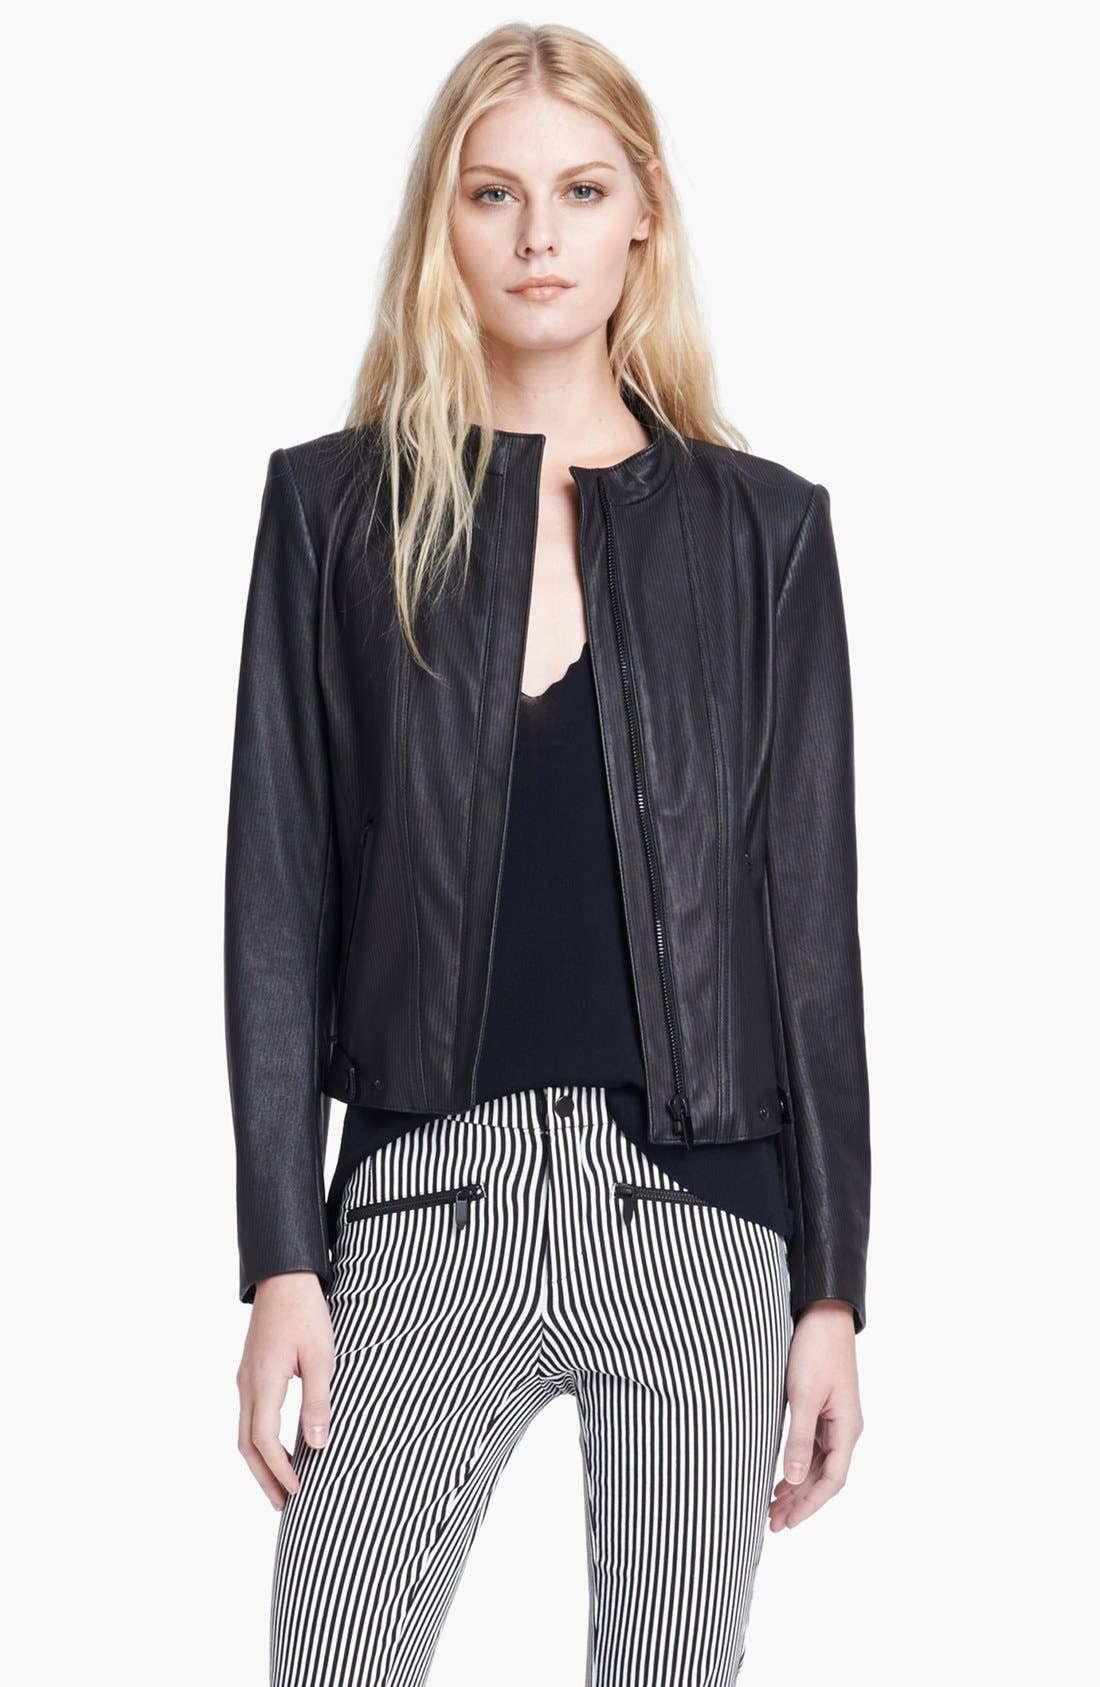 Main Image - Theyskens' Theory 'Jylan Netch' Stripe Leather Jacket